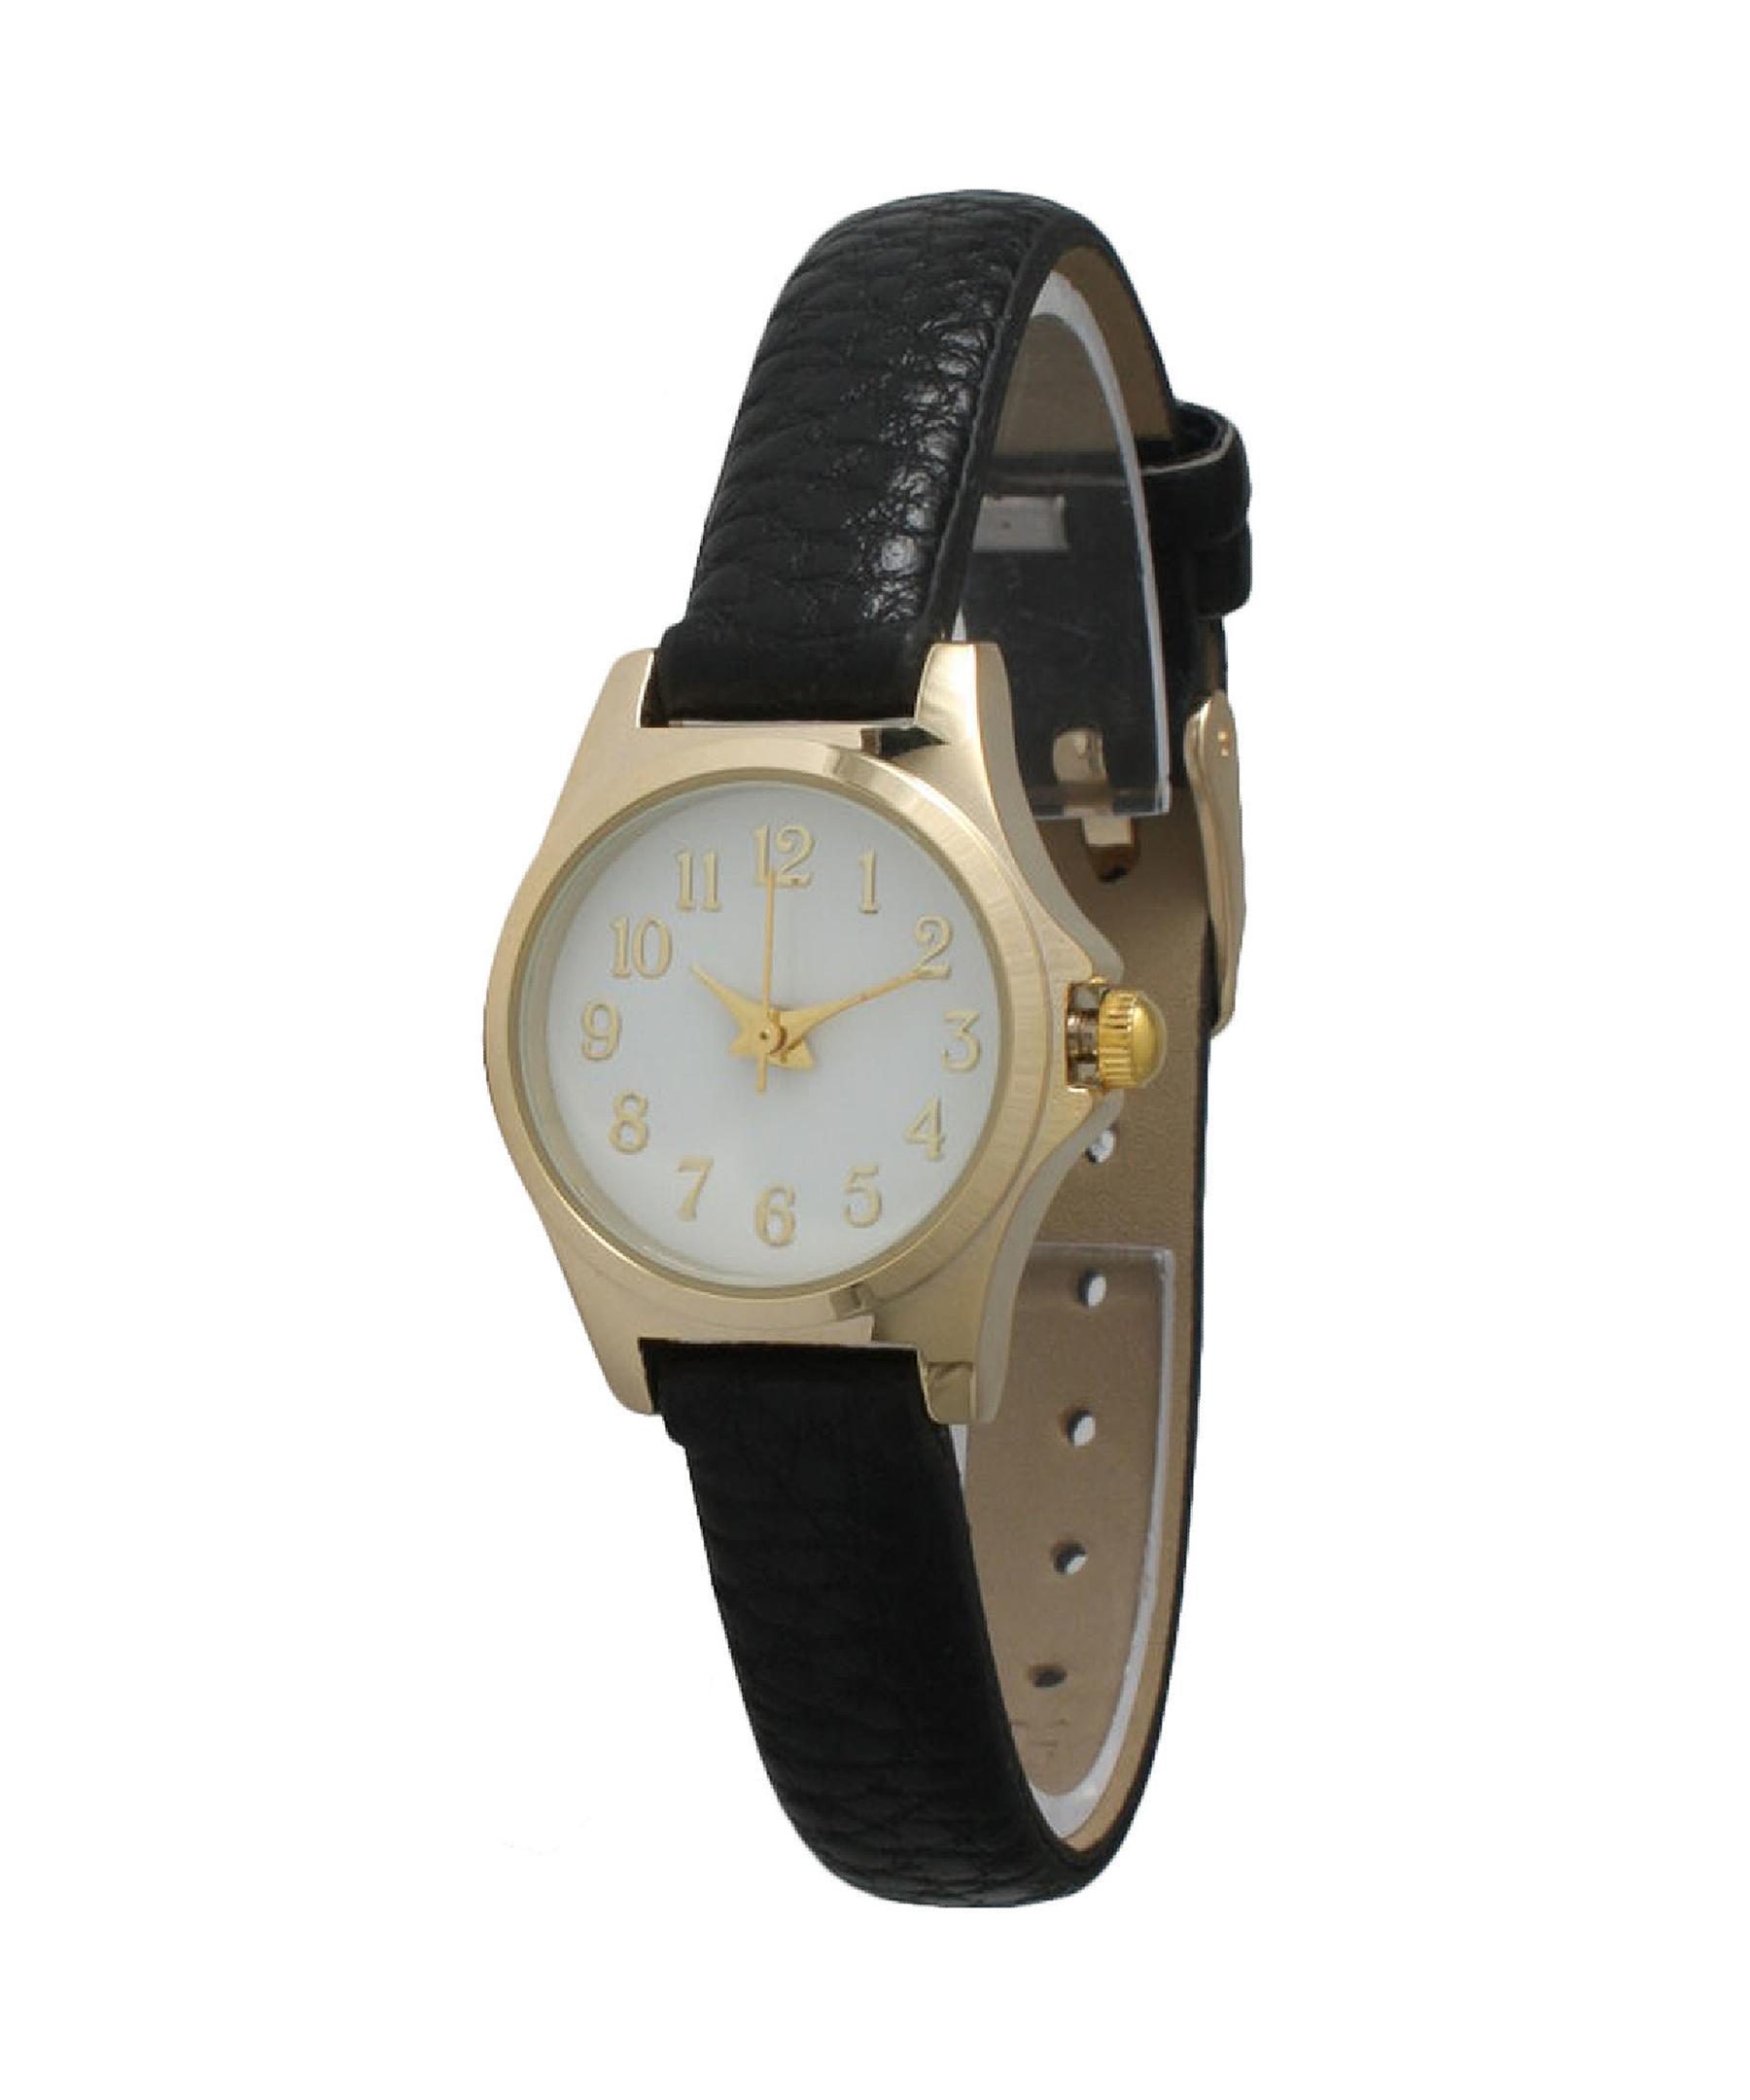 Olivia pratt Petite Vintage Style Women's Watch in Black ...